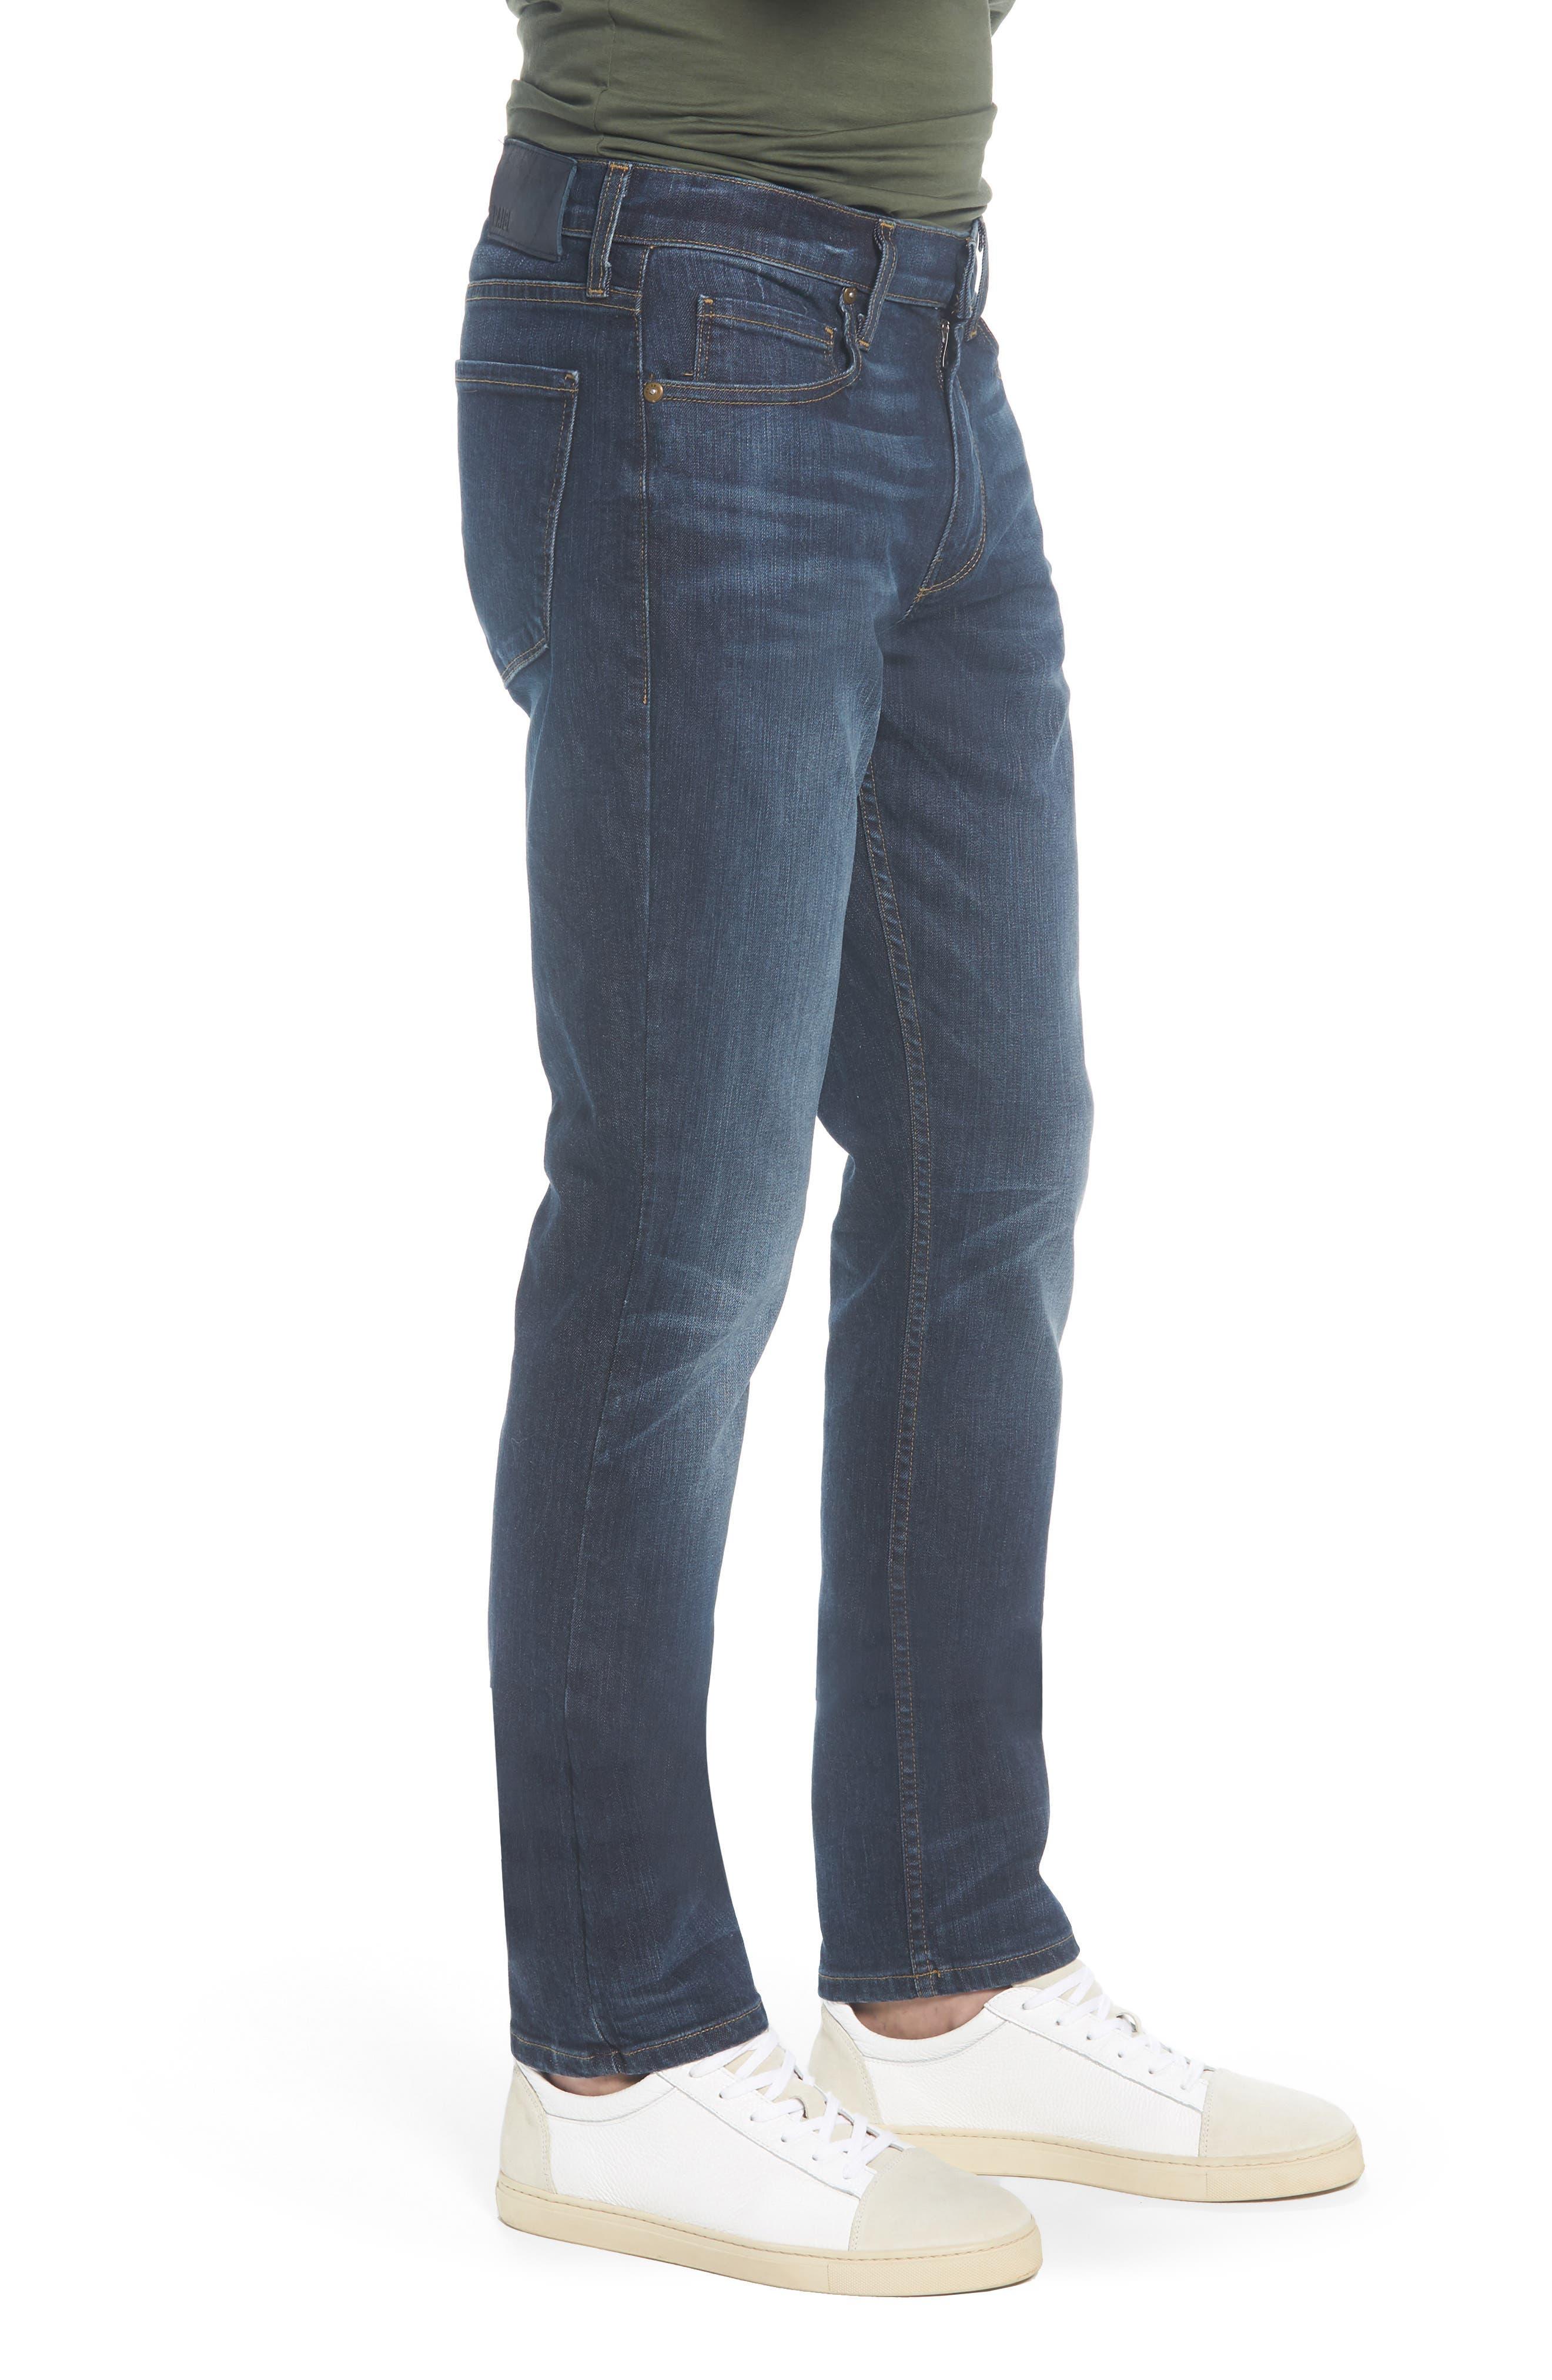 Transcend - Lennox Slim Fit Jeans,                             Alternate thumbnail 3, color,                             Hestan